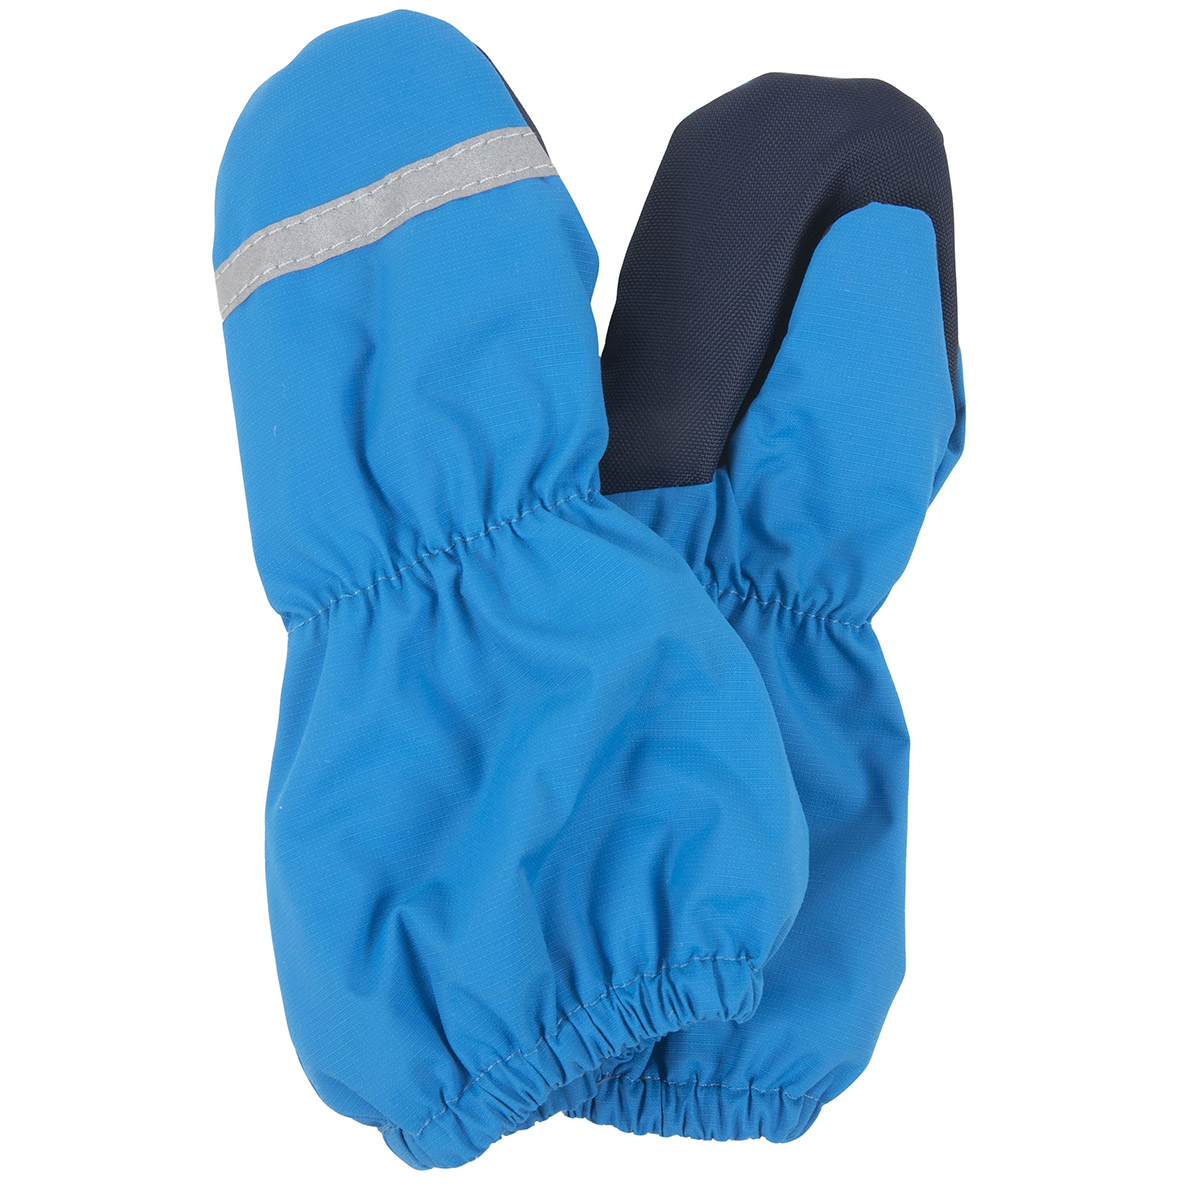 Рукавицы RAIN Kerry, Размер 2, Цвет 658-синий K20173-658_2